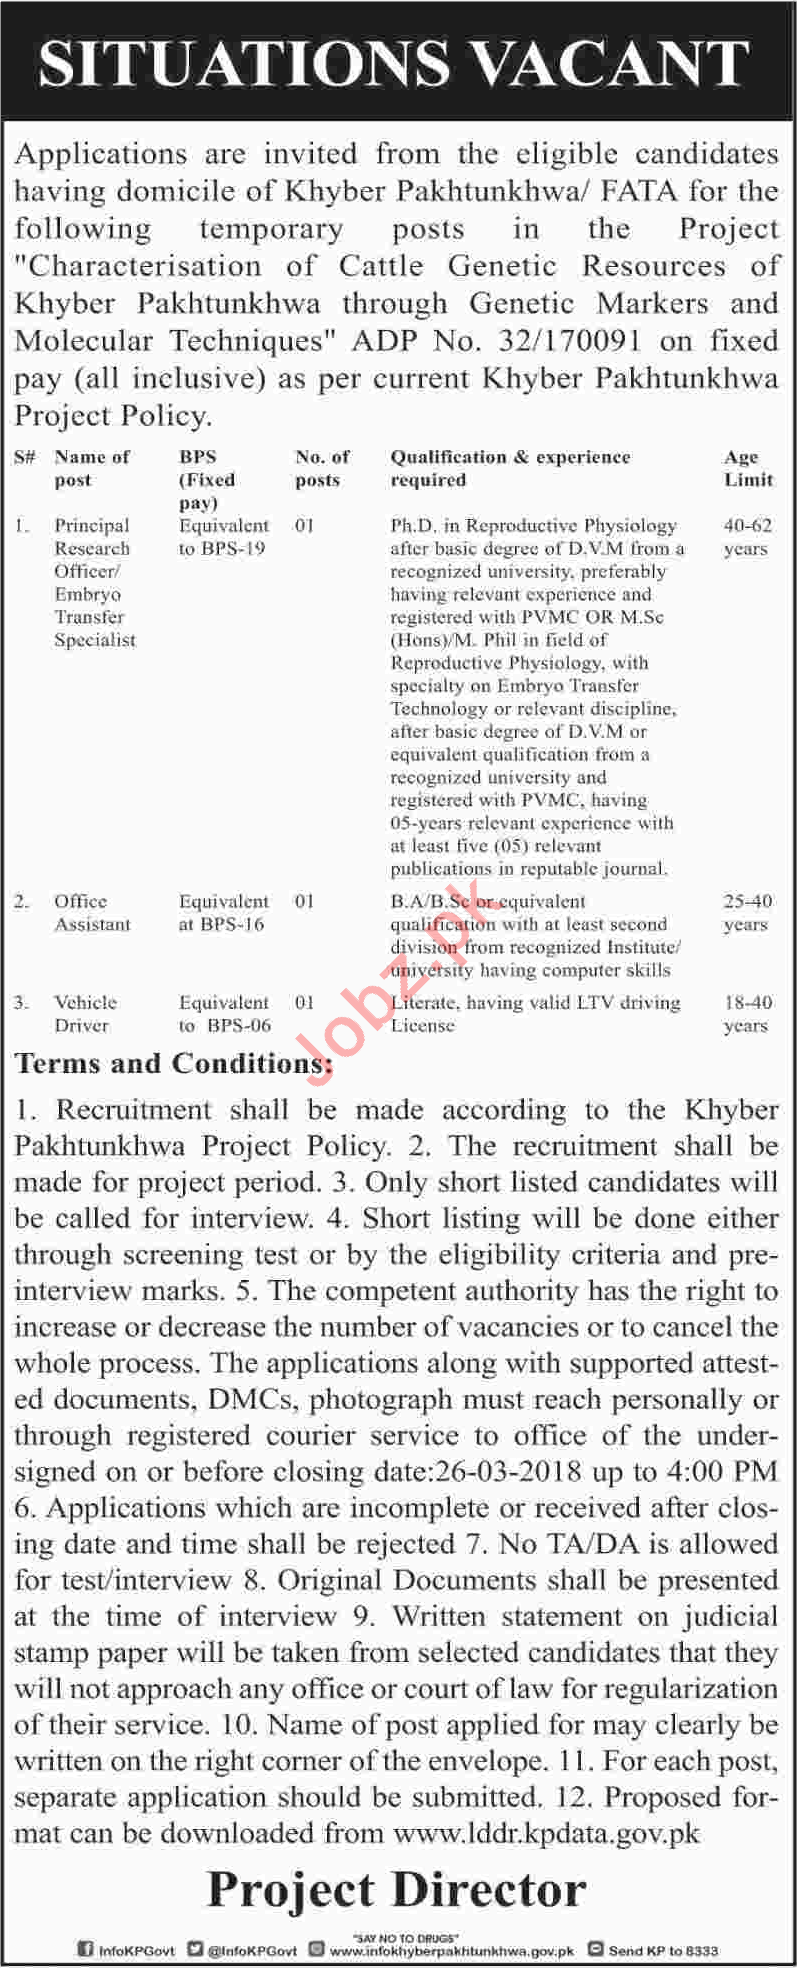 Public Sector Organization KPK Jobs 2018 Research Officer